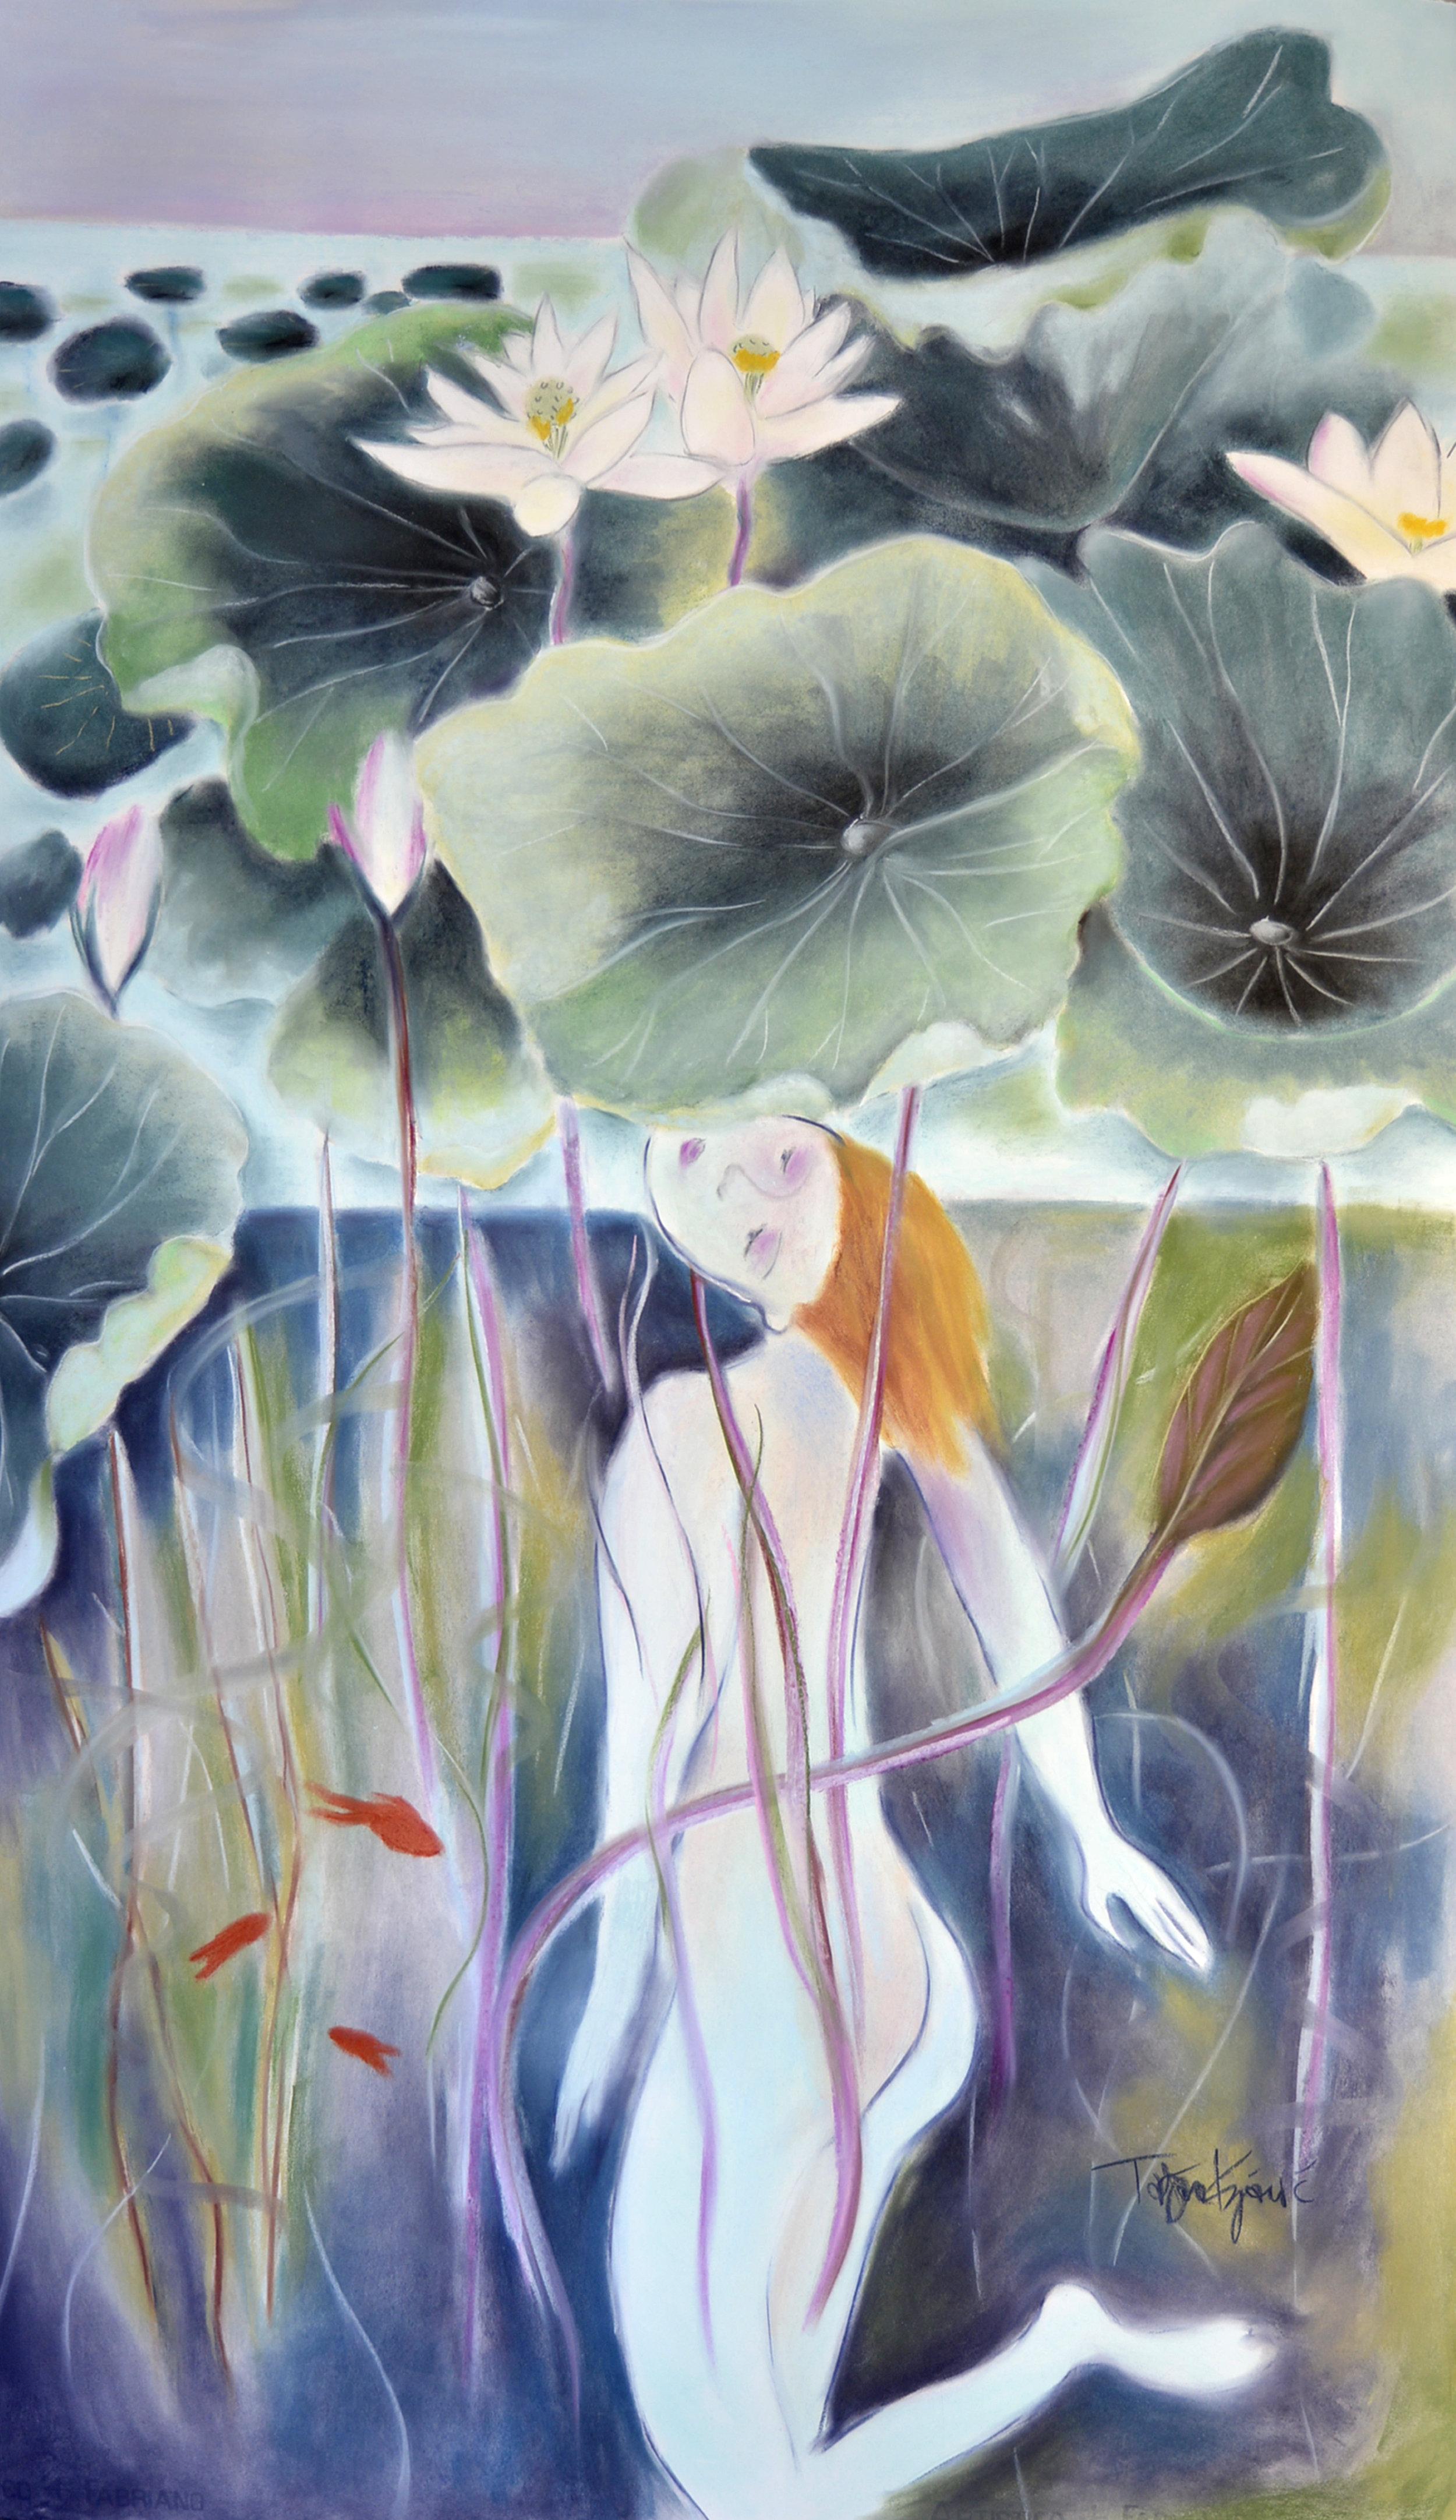 Lotus Pond Diver print series.  Medium and large scale archival prints on acid free paper.